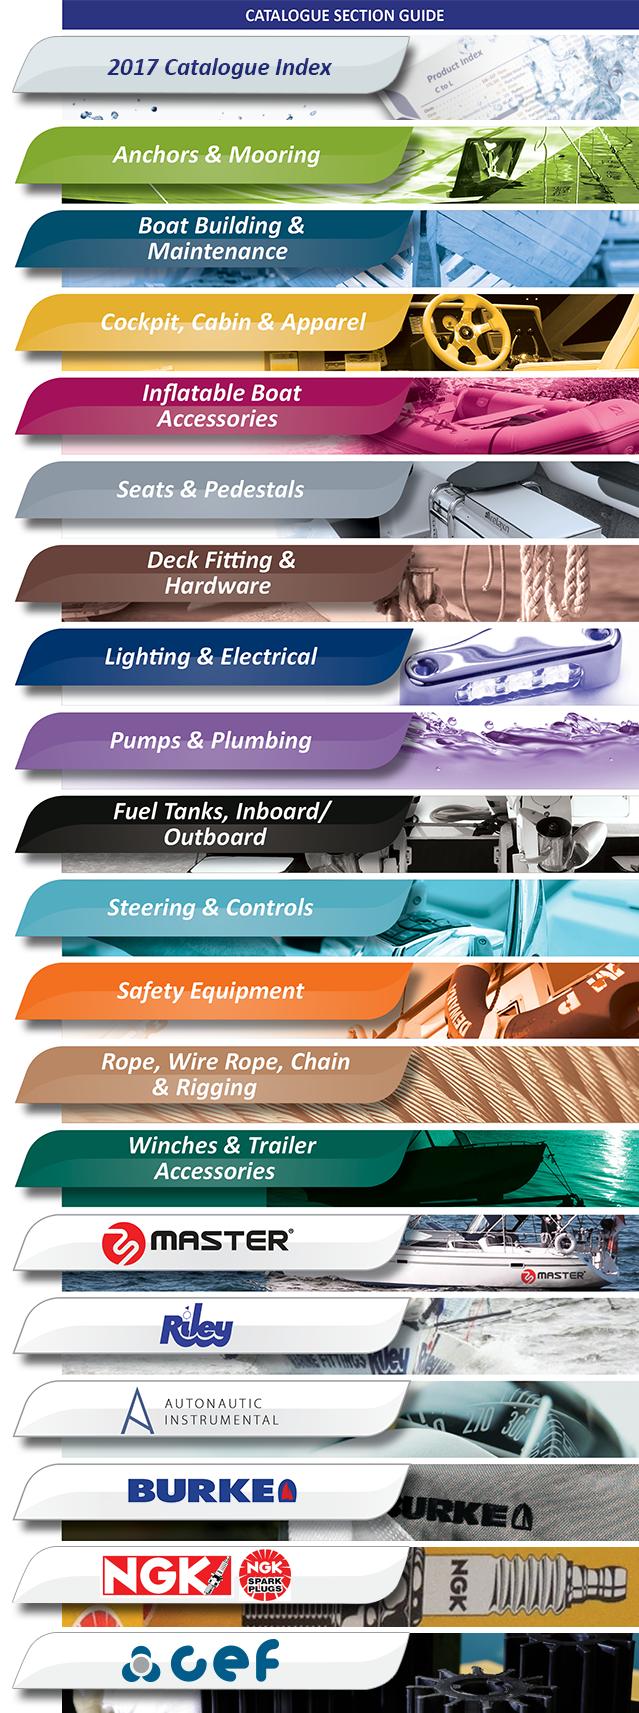 Catalogues - Impellors, VDO Marine Gauges, Marine Deck Lights